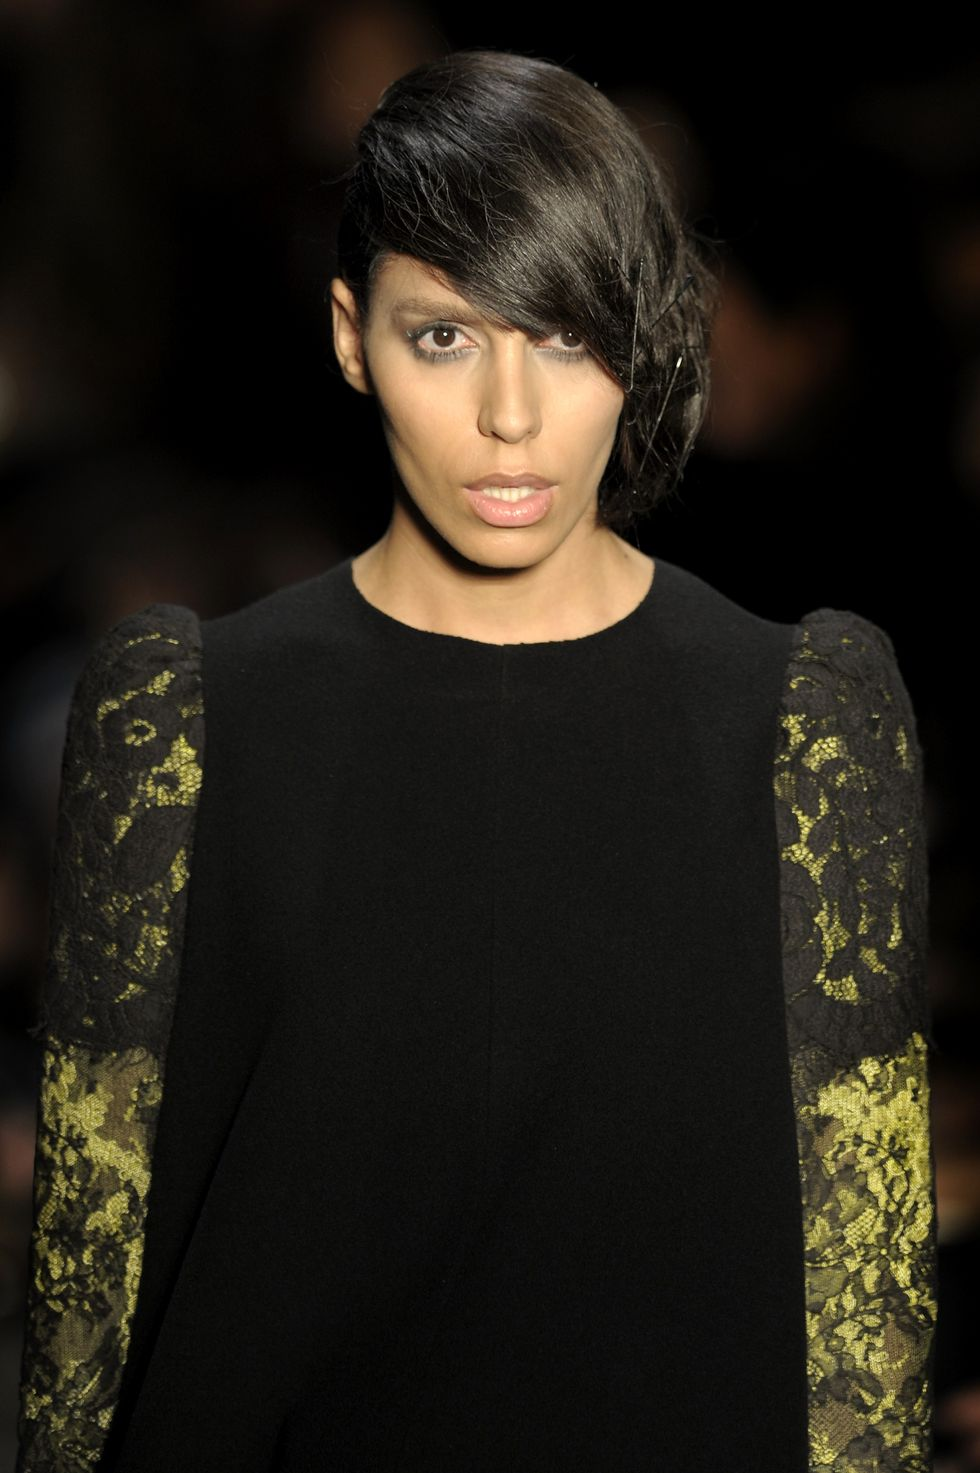 Lea T, dopo Givenchy anche Redken